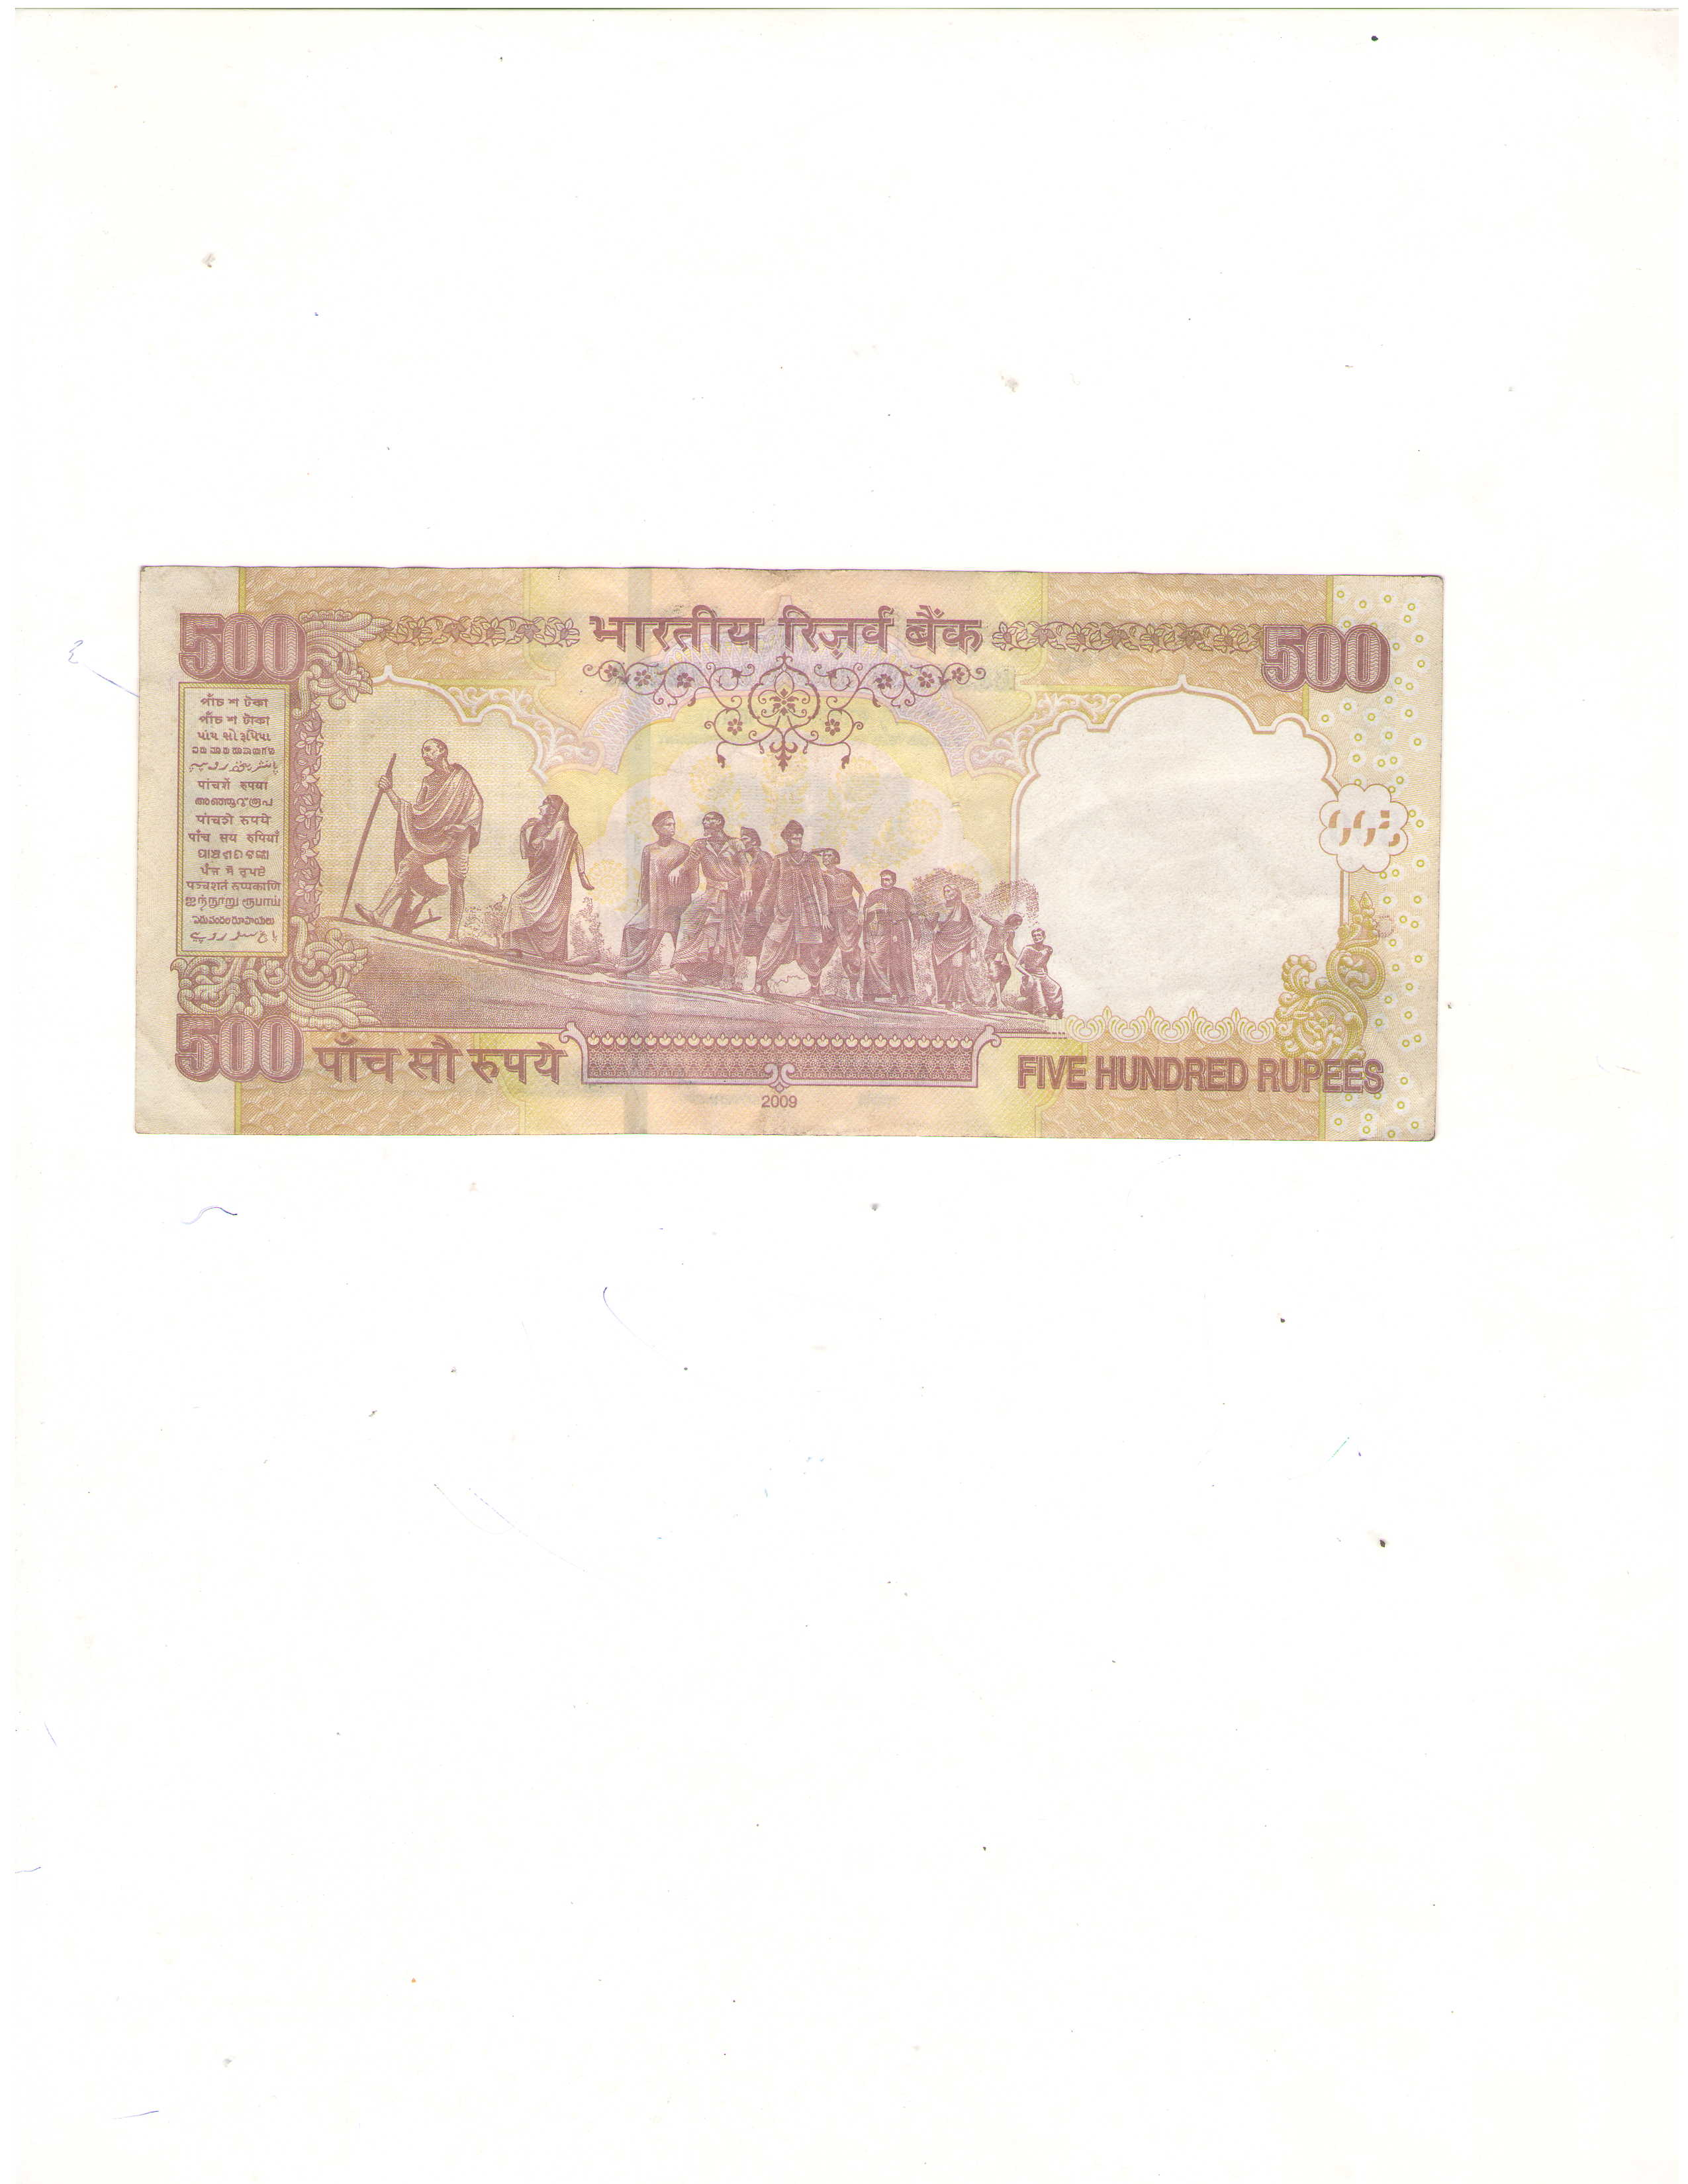 500 Rupees Note Number Error